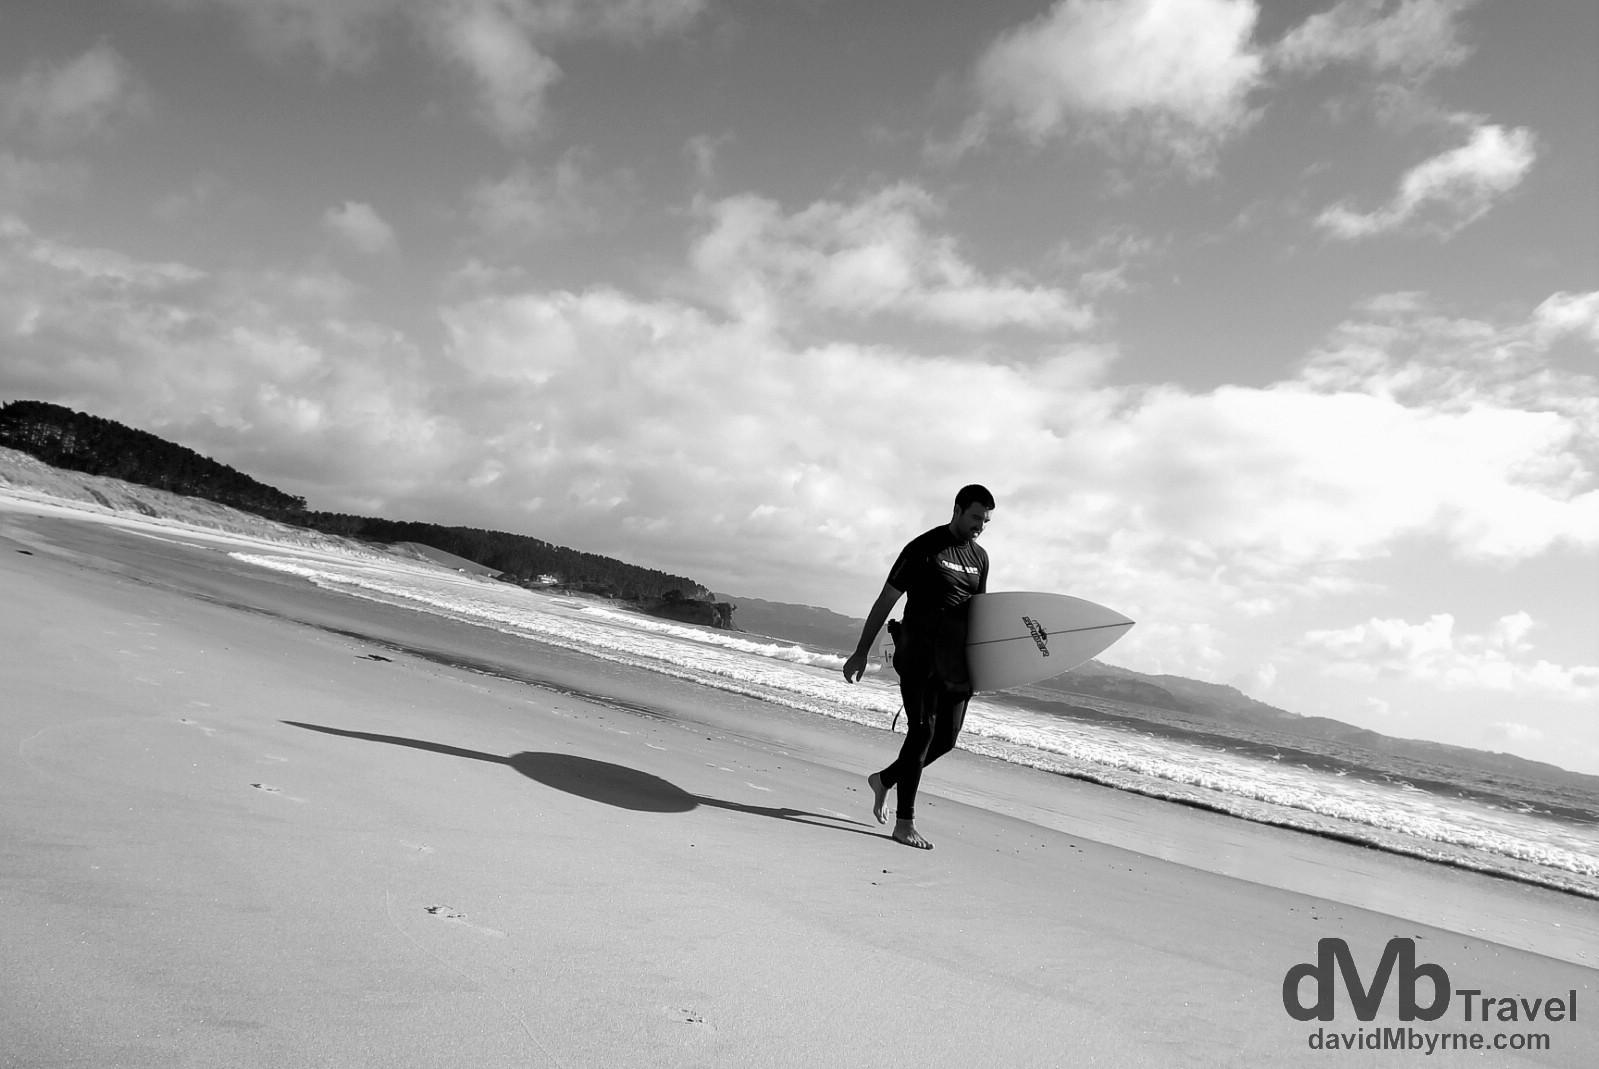 A surfer walking on the beach in Tawharanui Regional Park, North Island, New Zealand. April 28th 2012.